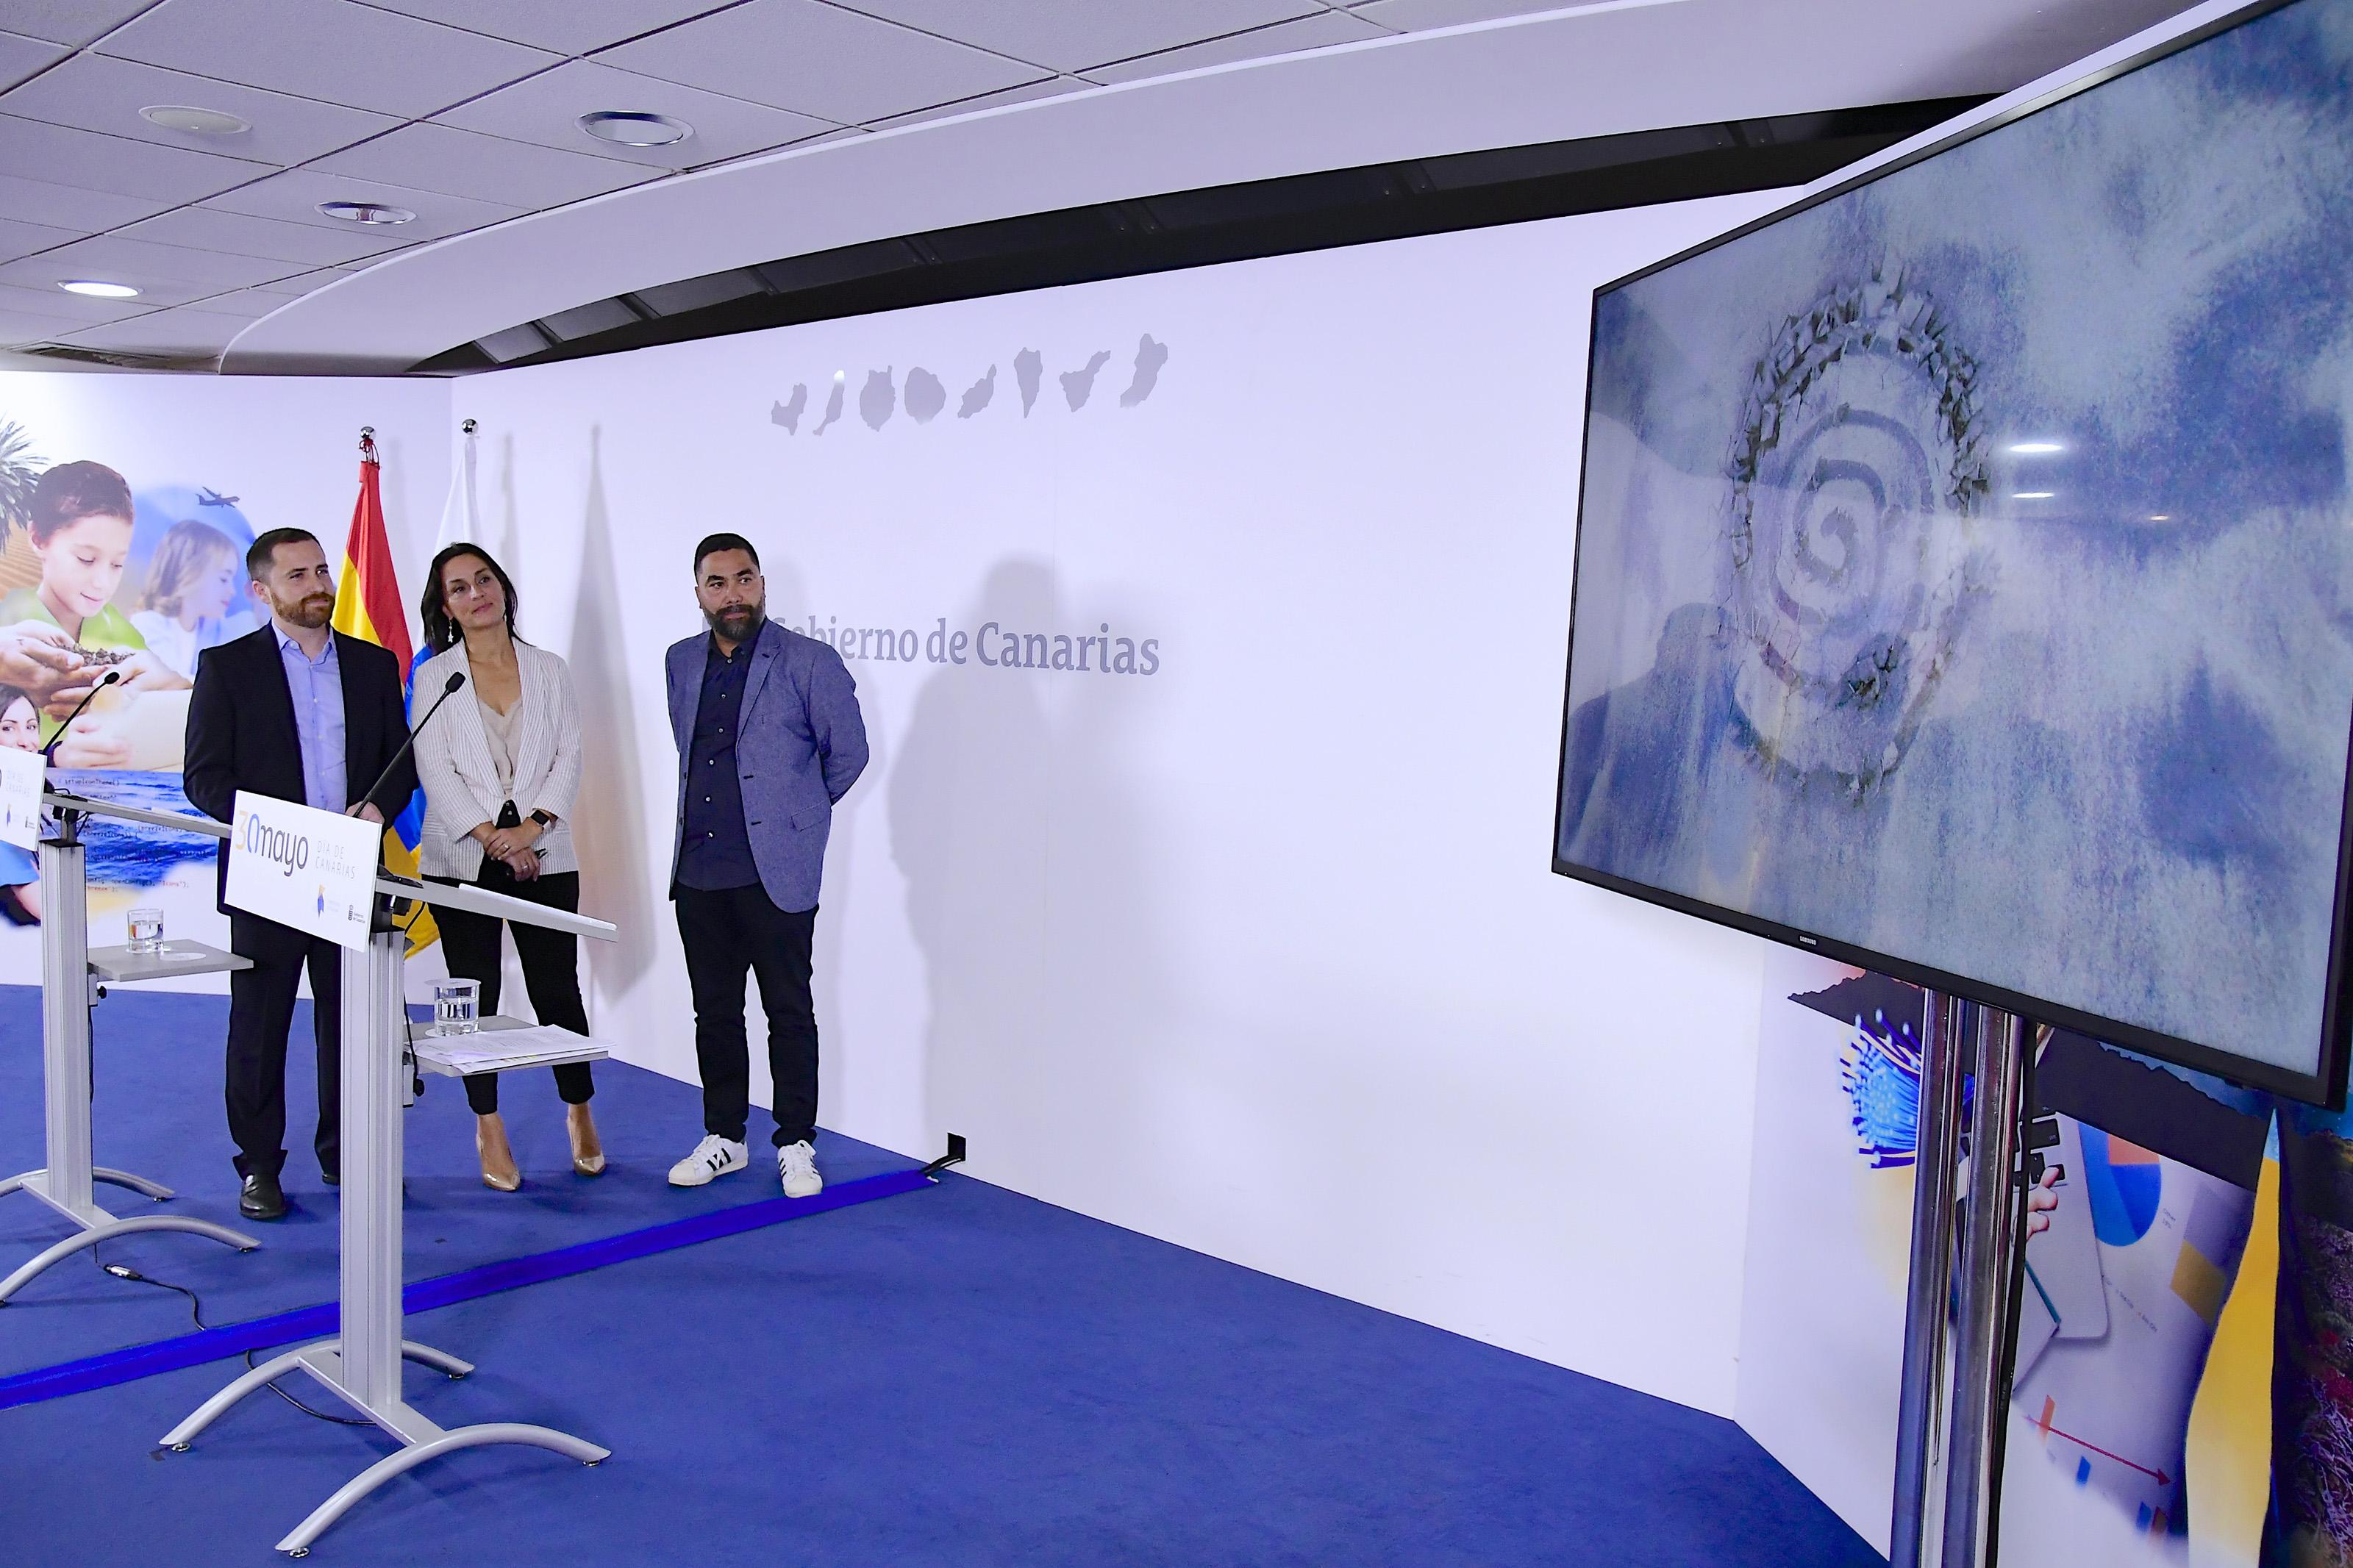 rp Día de Canarias Isaac Castellano, Alexandra Betancort e Israel Reyes2